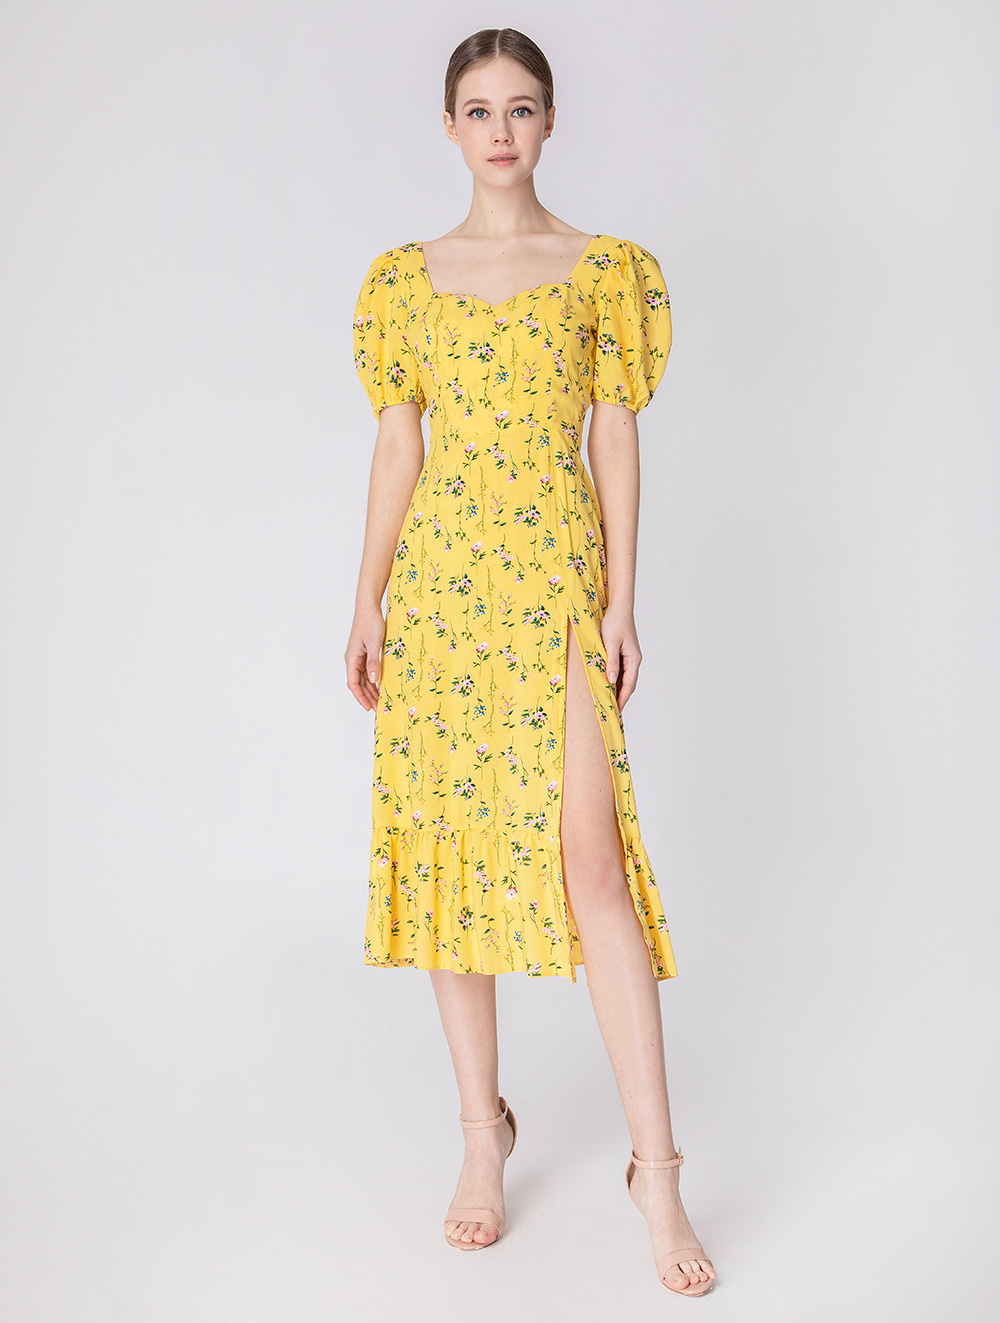 Elpida dress